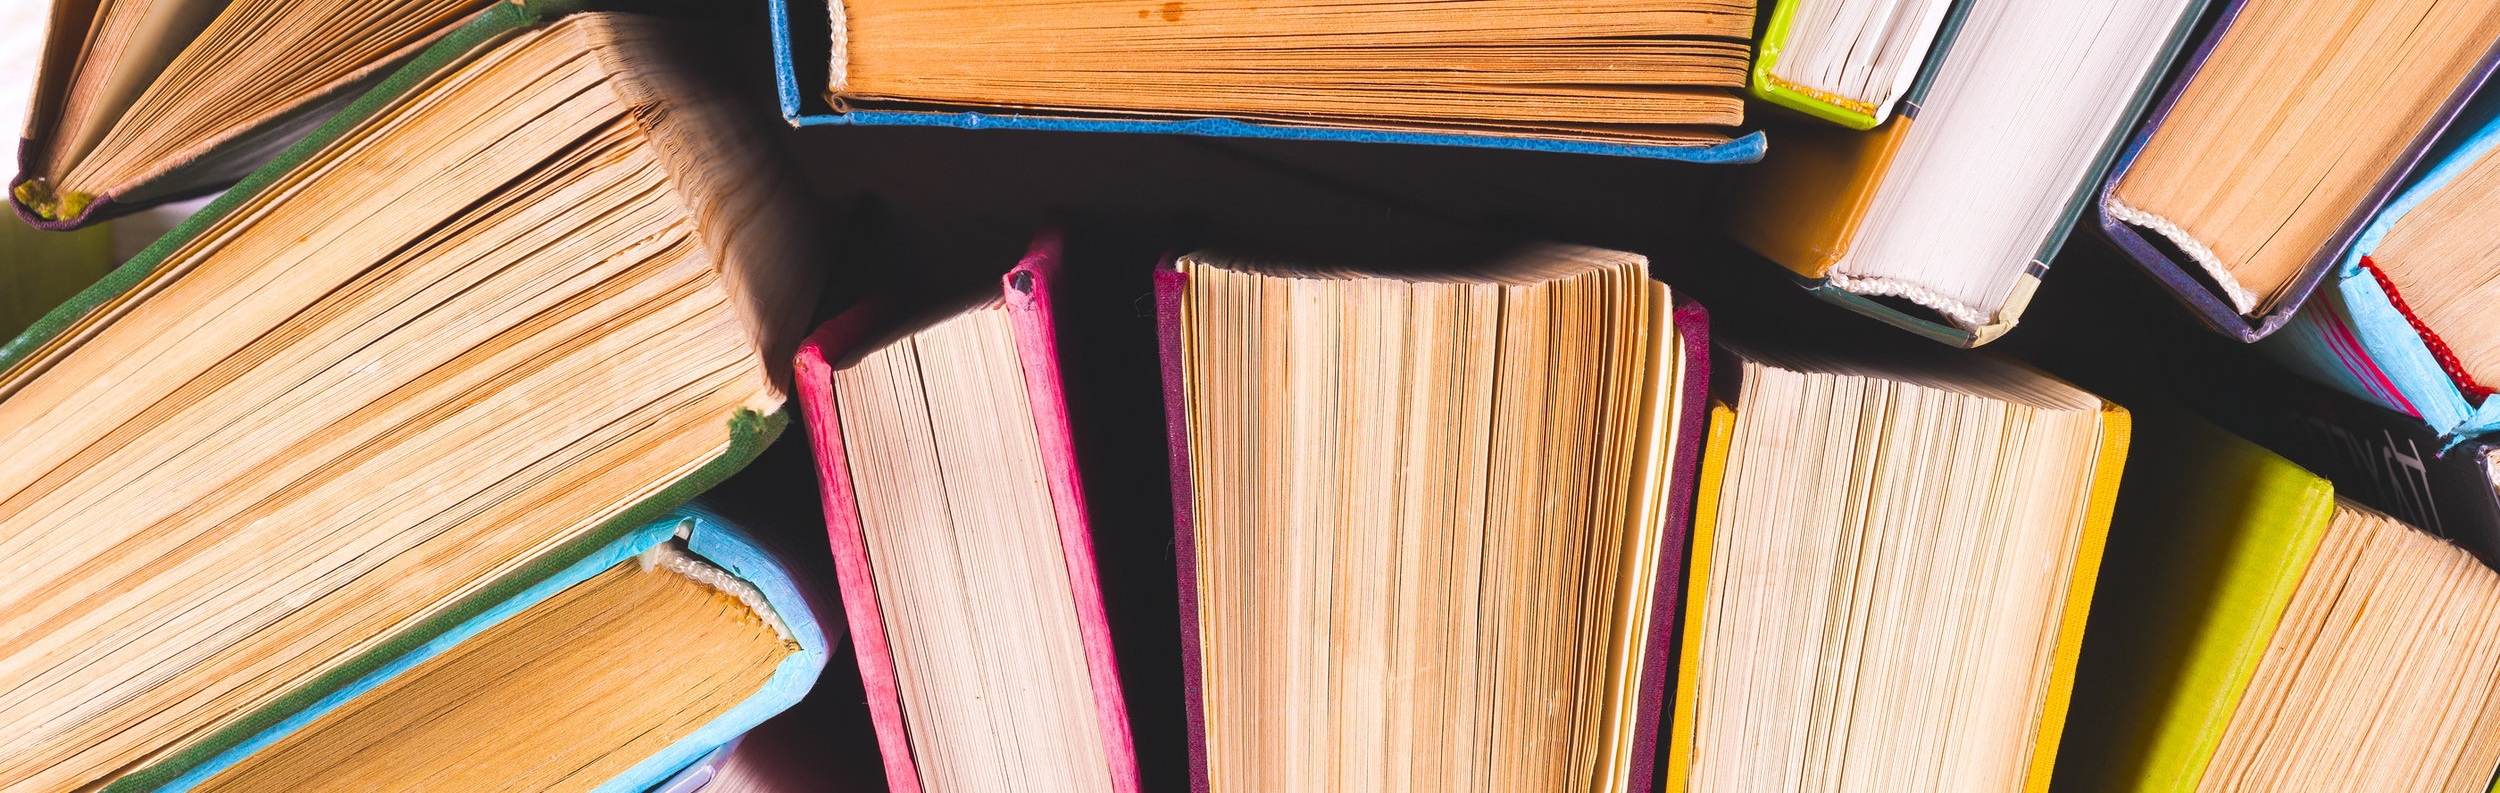 bigstock-Open-Book-Hardback-Books-On-B-228239119.jpg